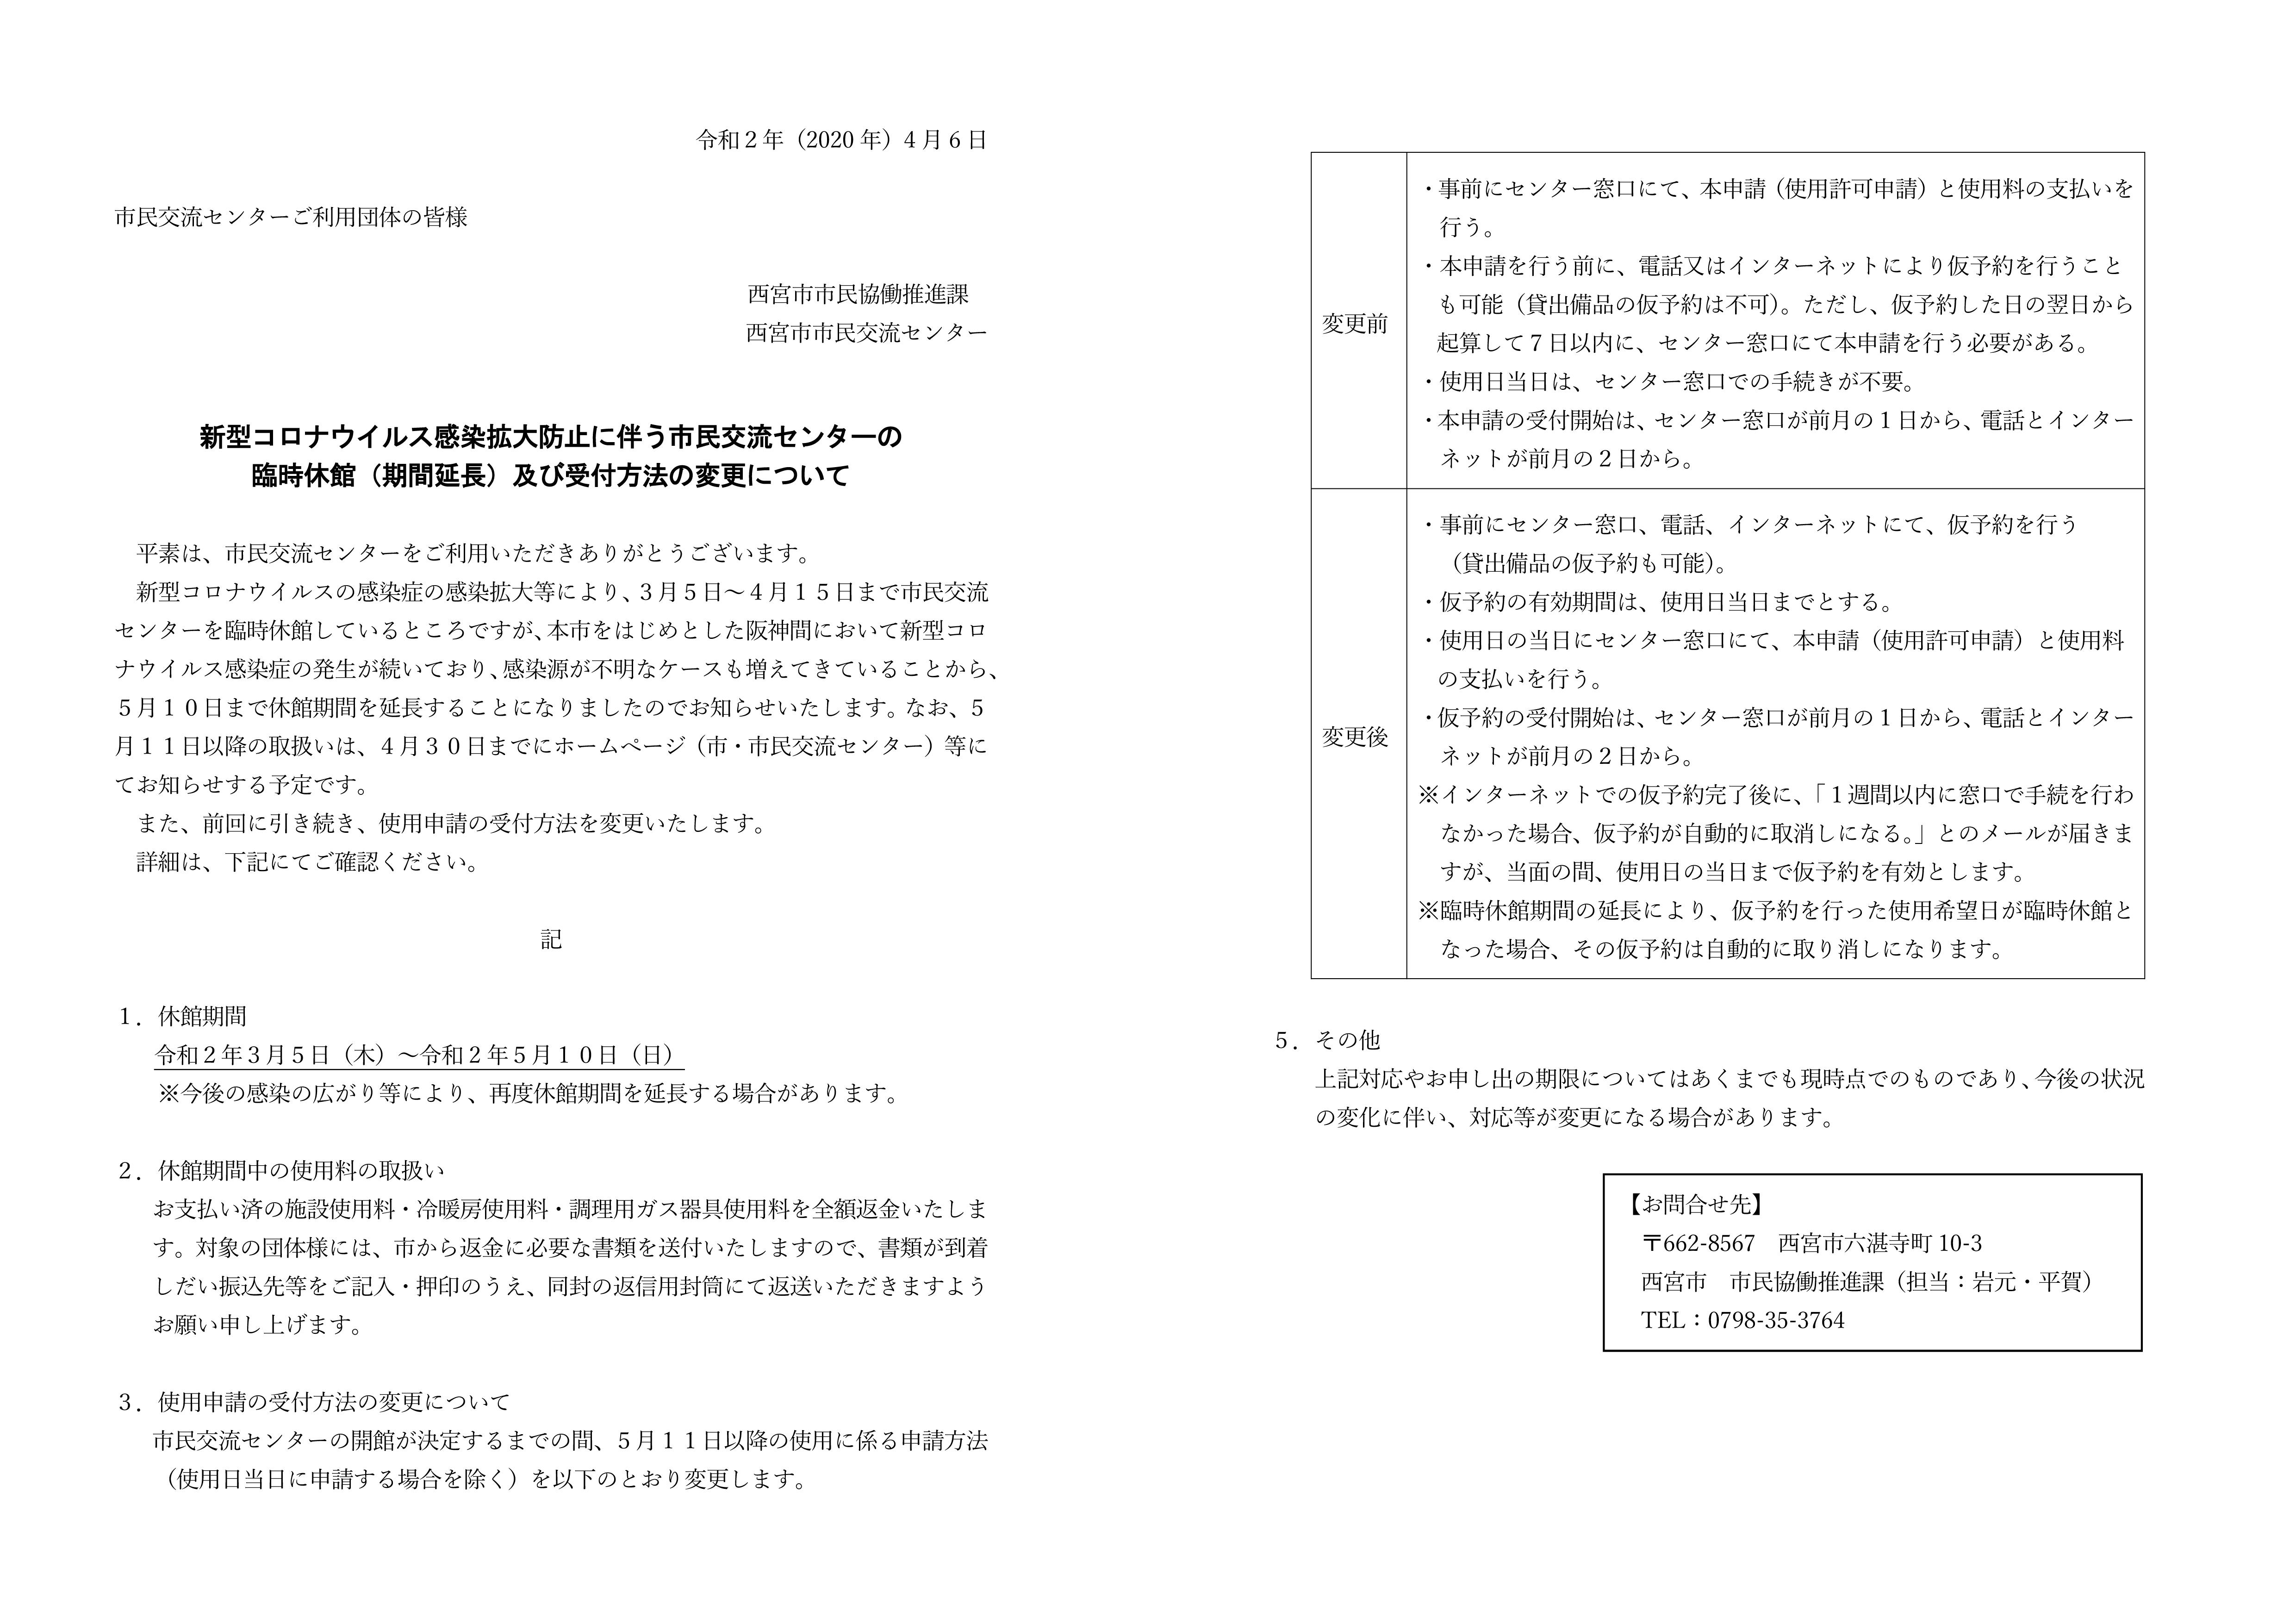 【HP掲載用】休館期間延長のお知らせ文書